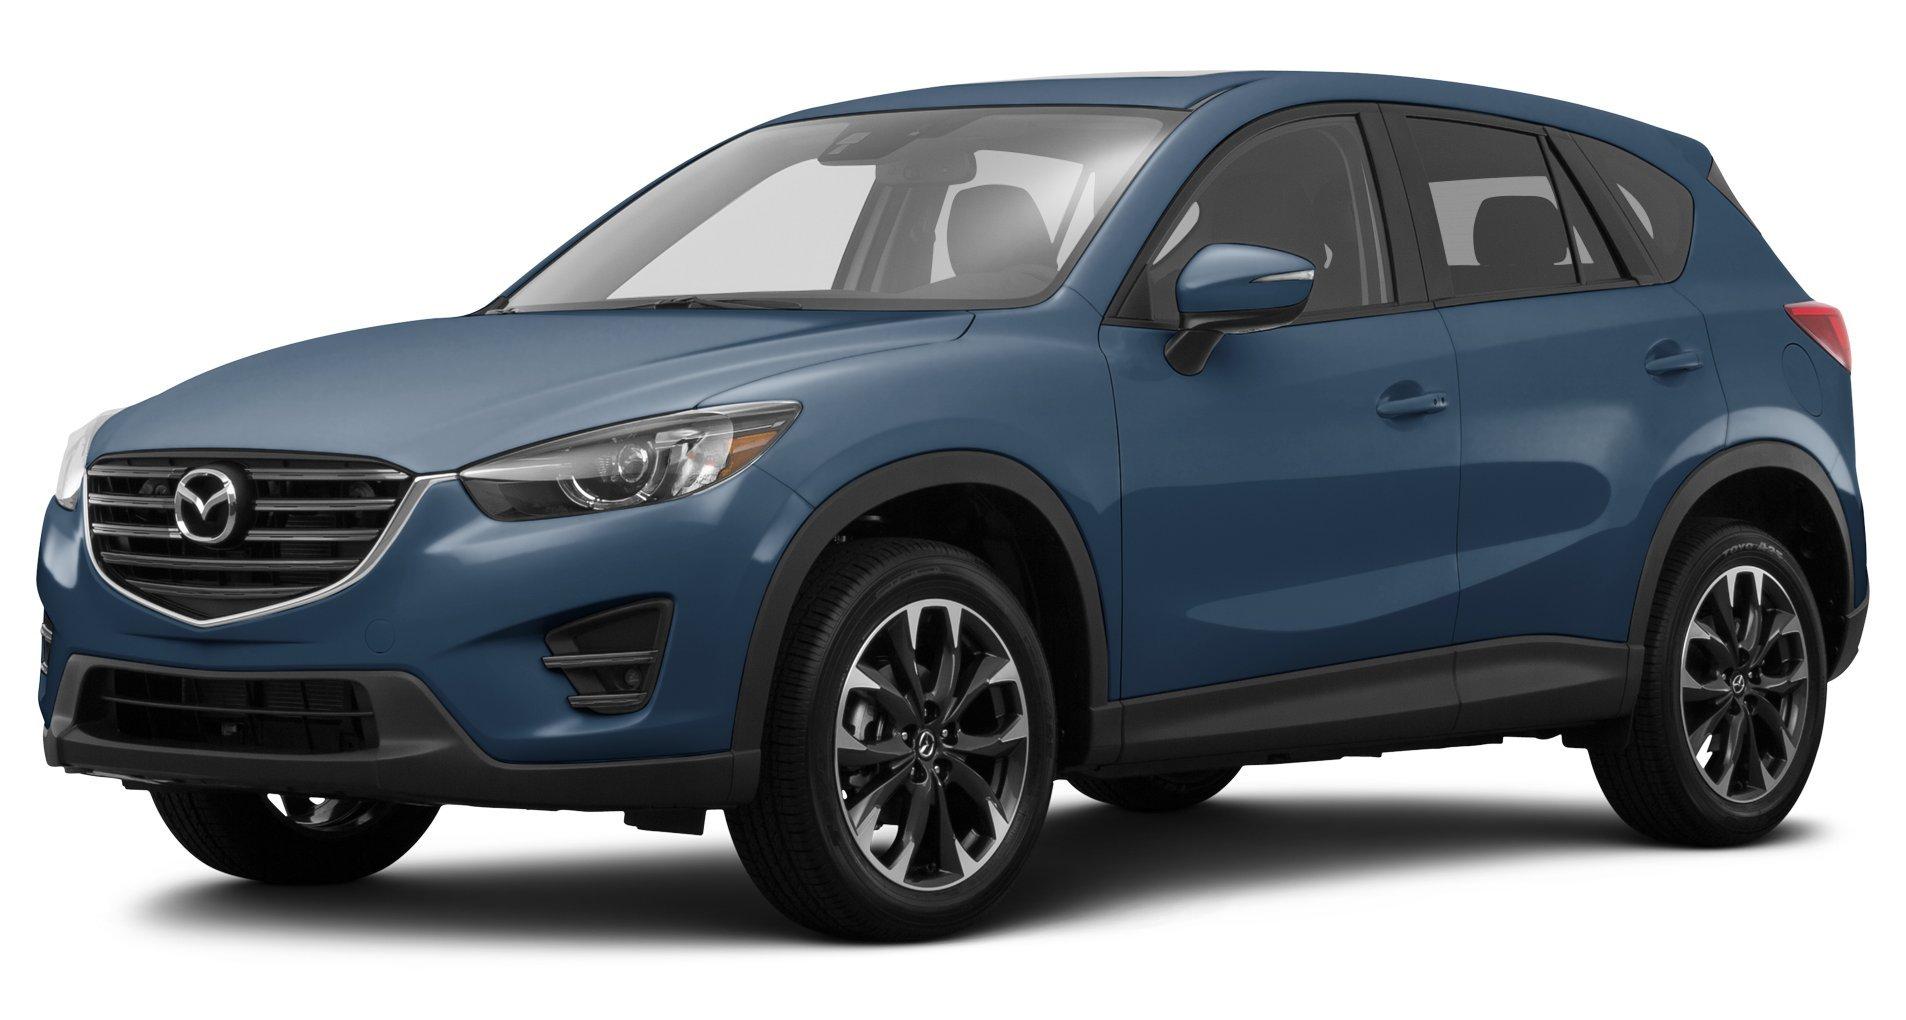 Amazon.com: 2016 Mazda CX-5 Grand Touring Reviews, Images